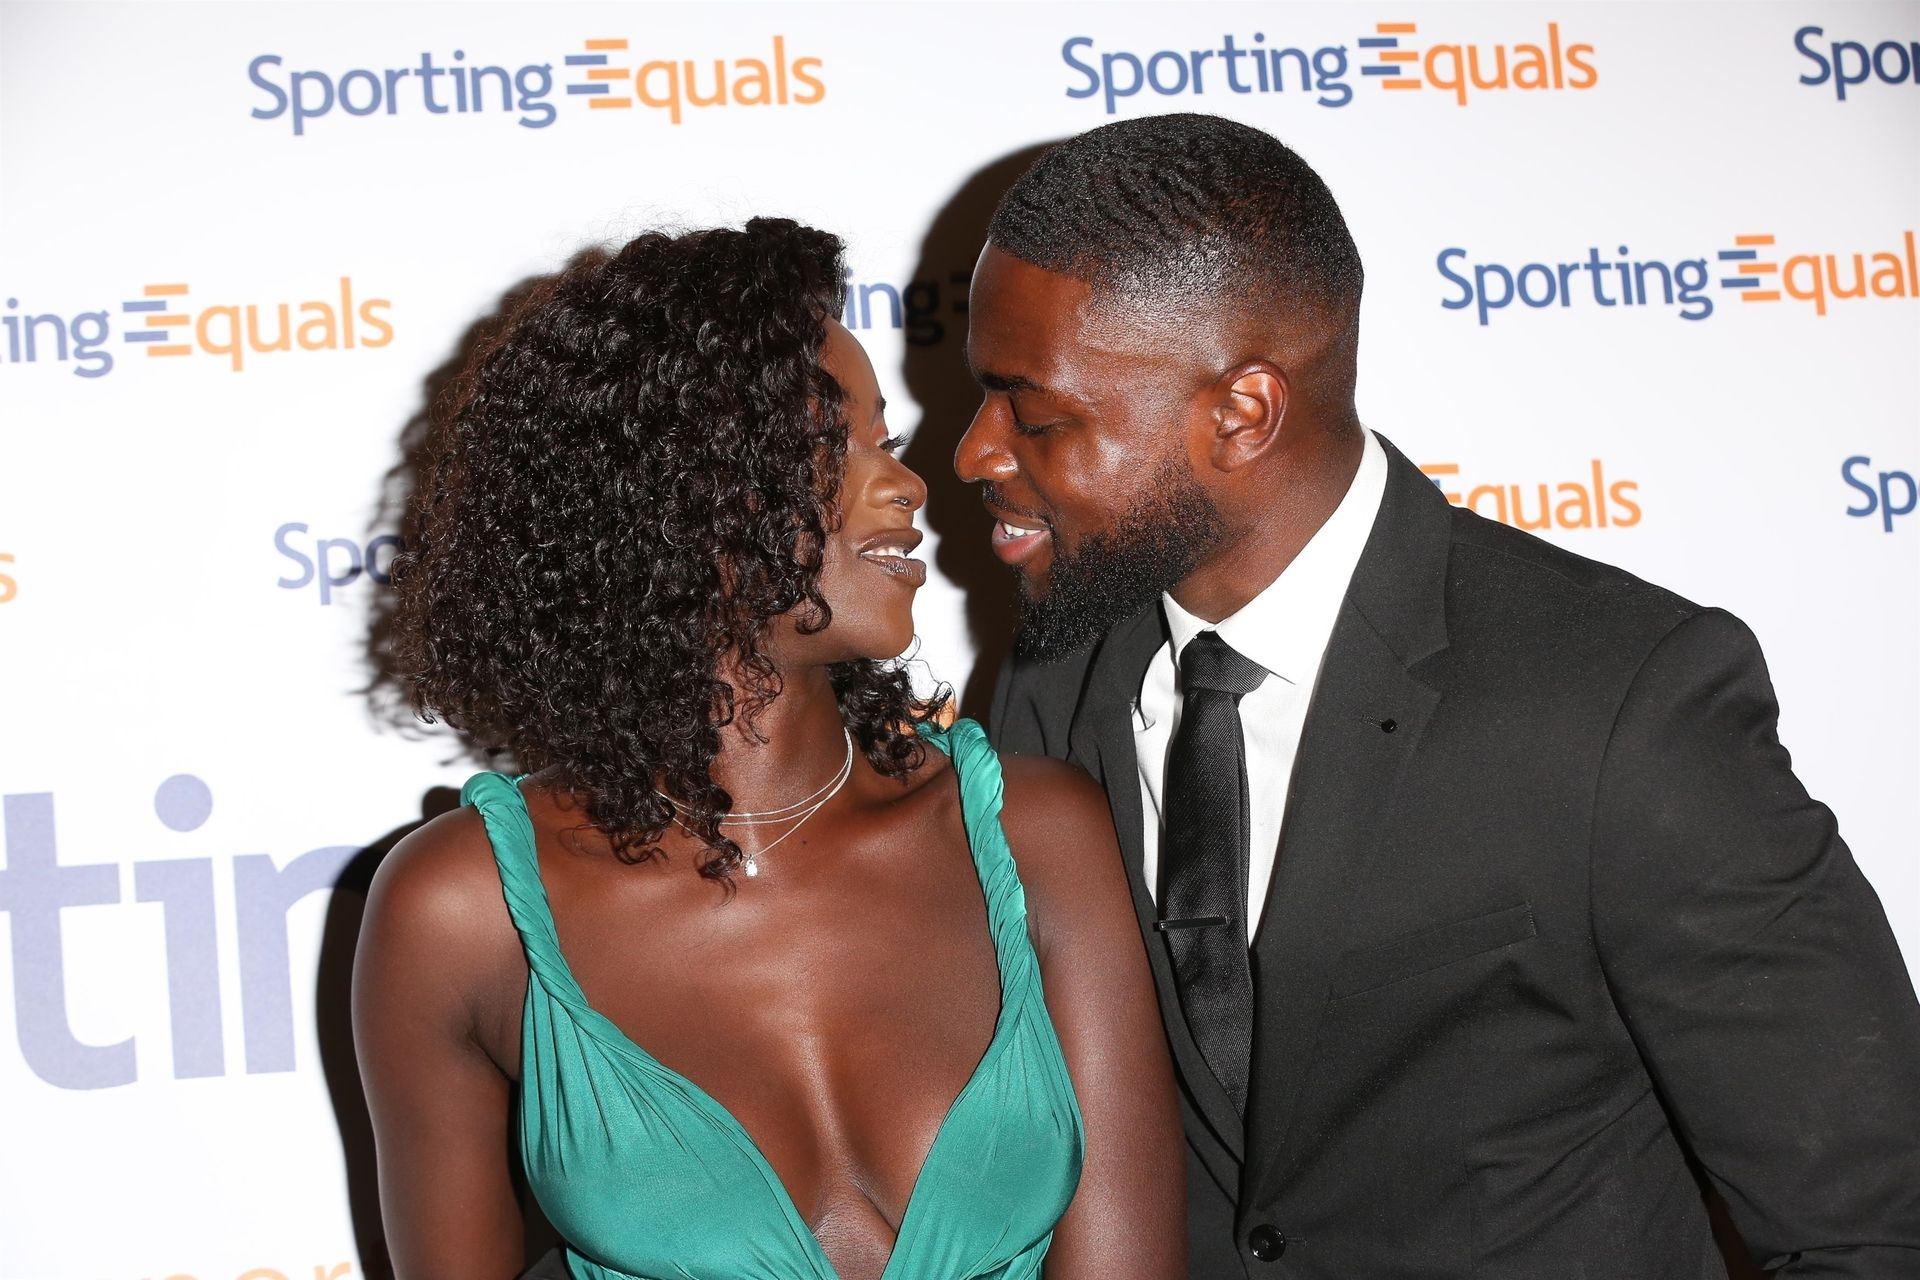 Mike Boateng & Priscilla Anyabu Are Seen At British Ethnic Diversity Sports Awards 0107